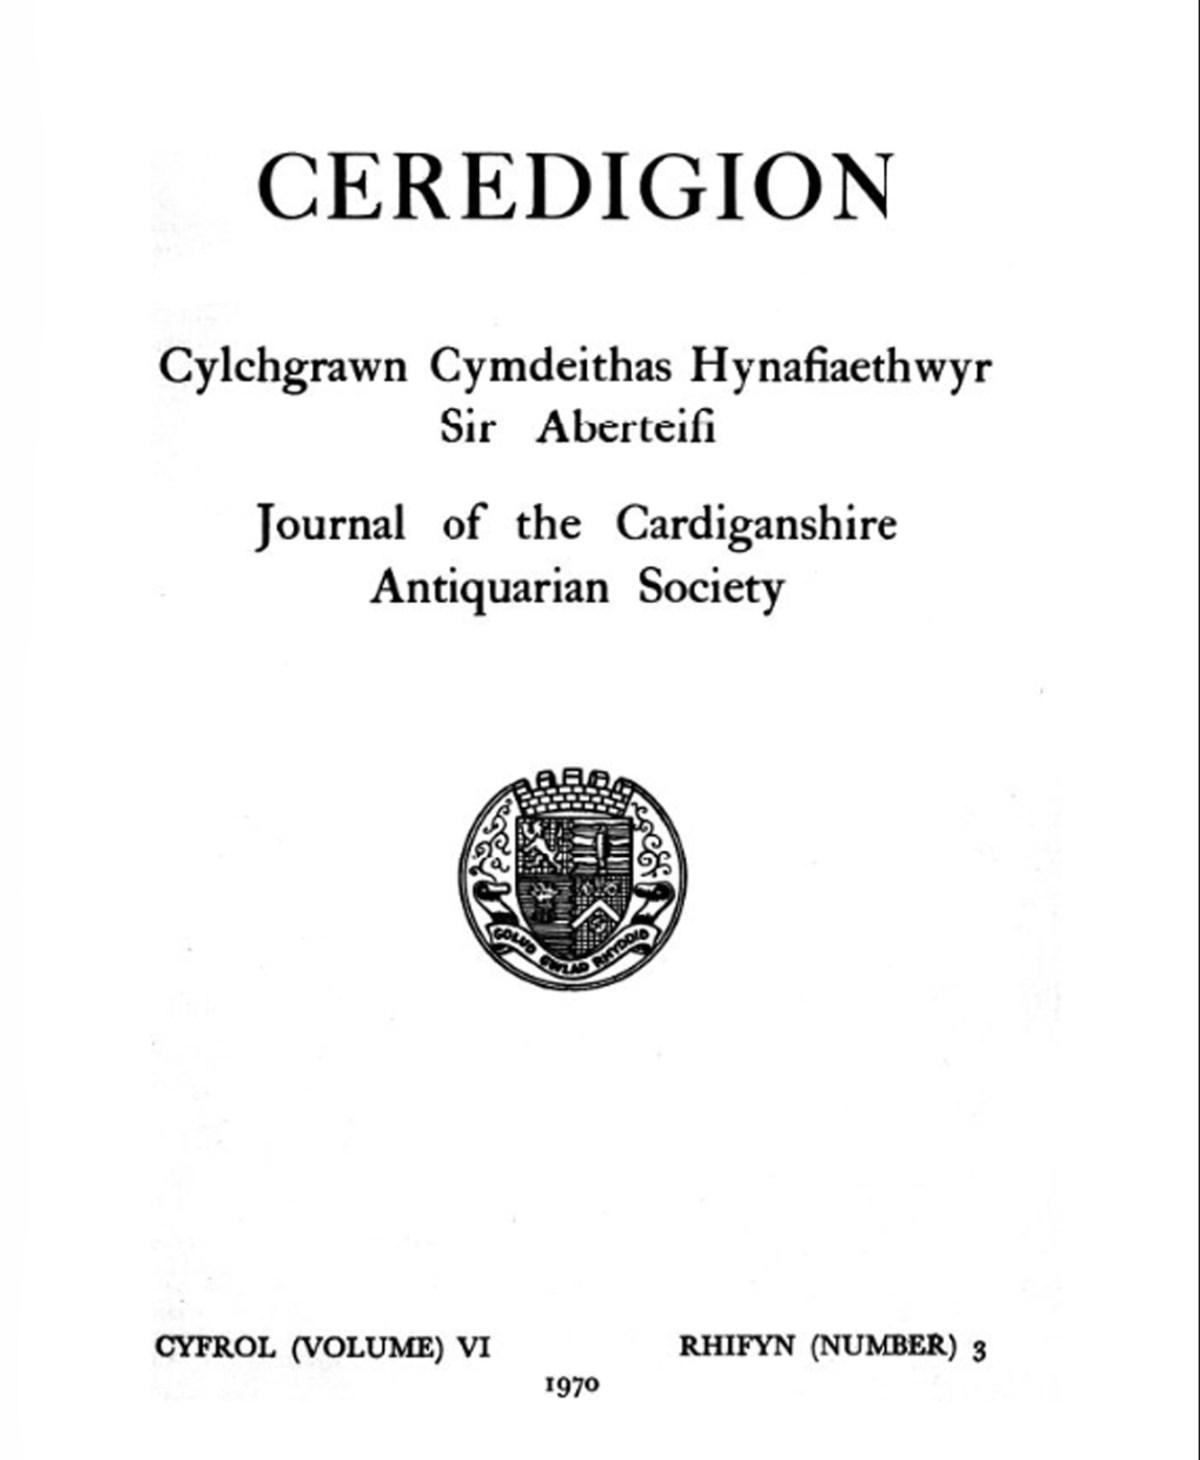 Ceredigion – Journal of the Cardiganshire Antiquarian Society, 1970 Vol VI No 3